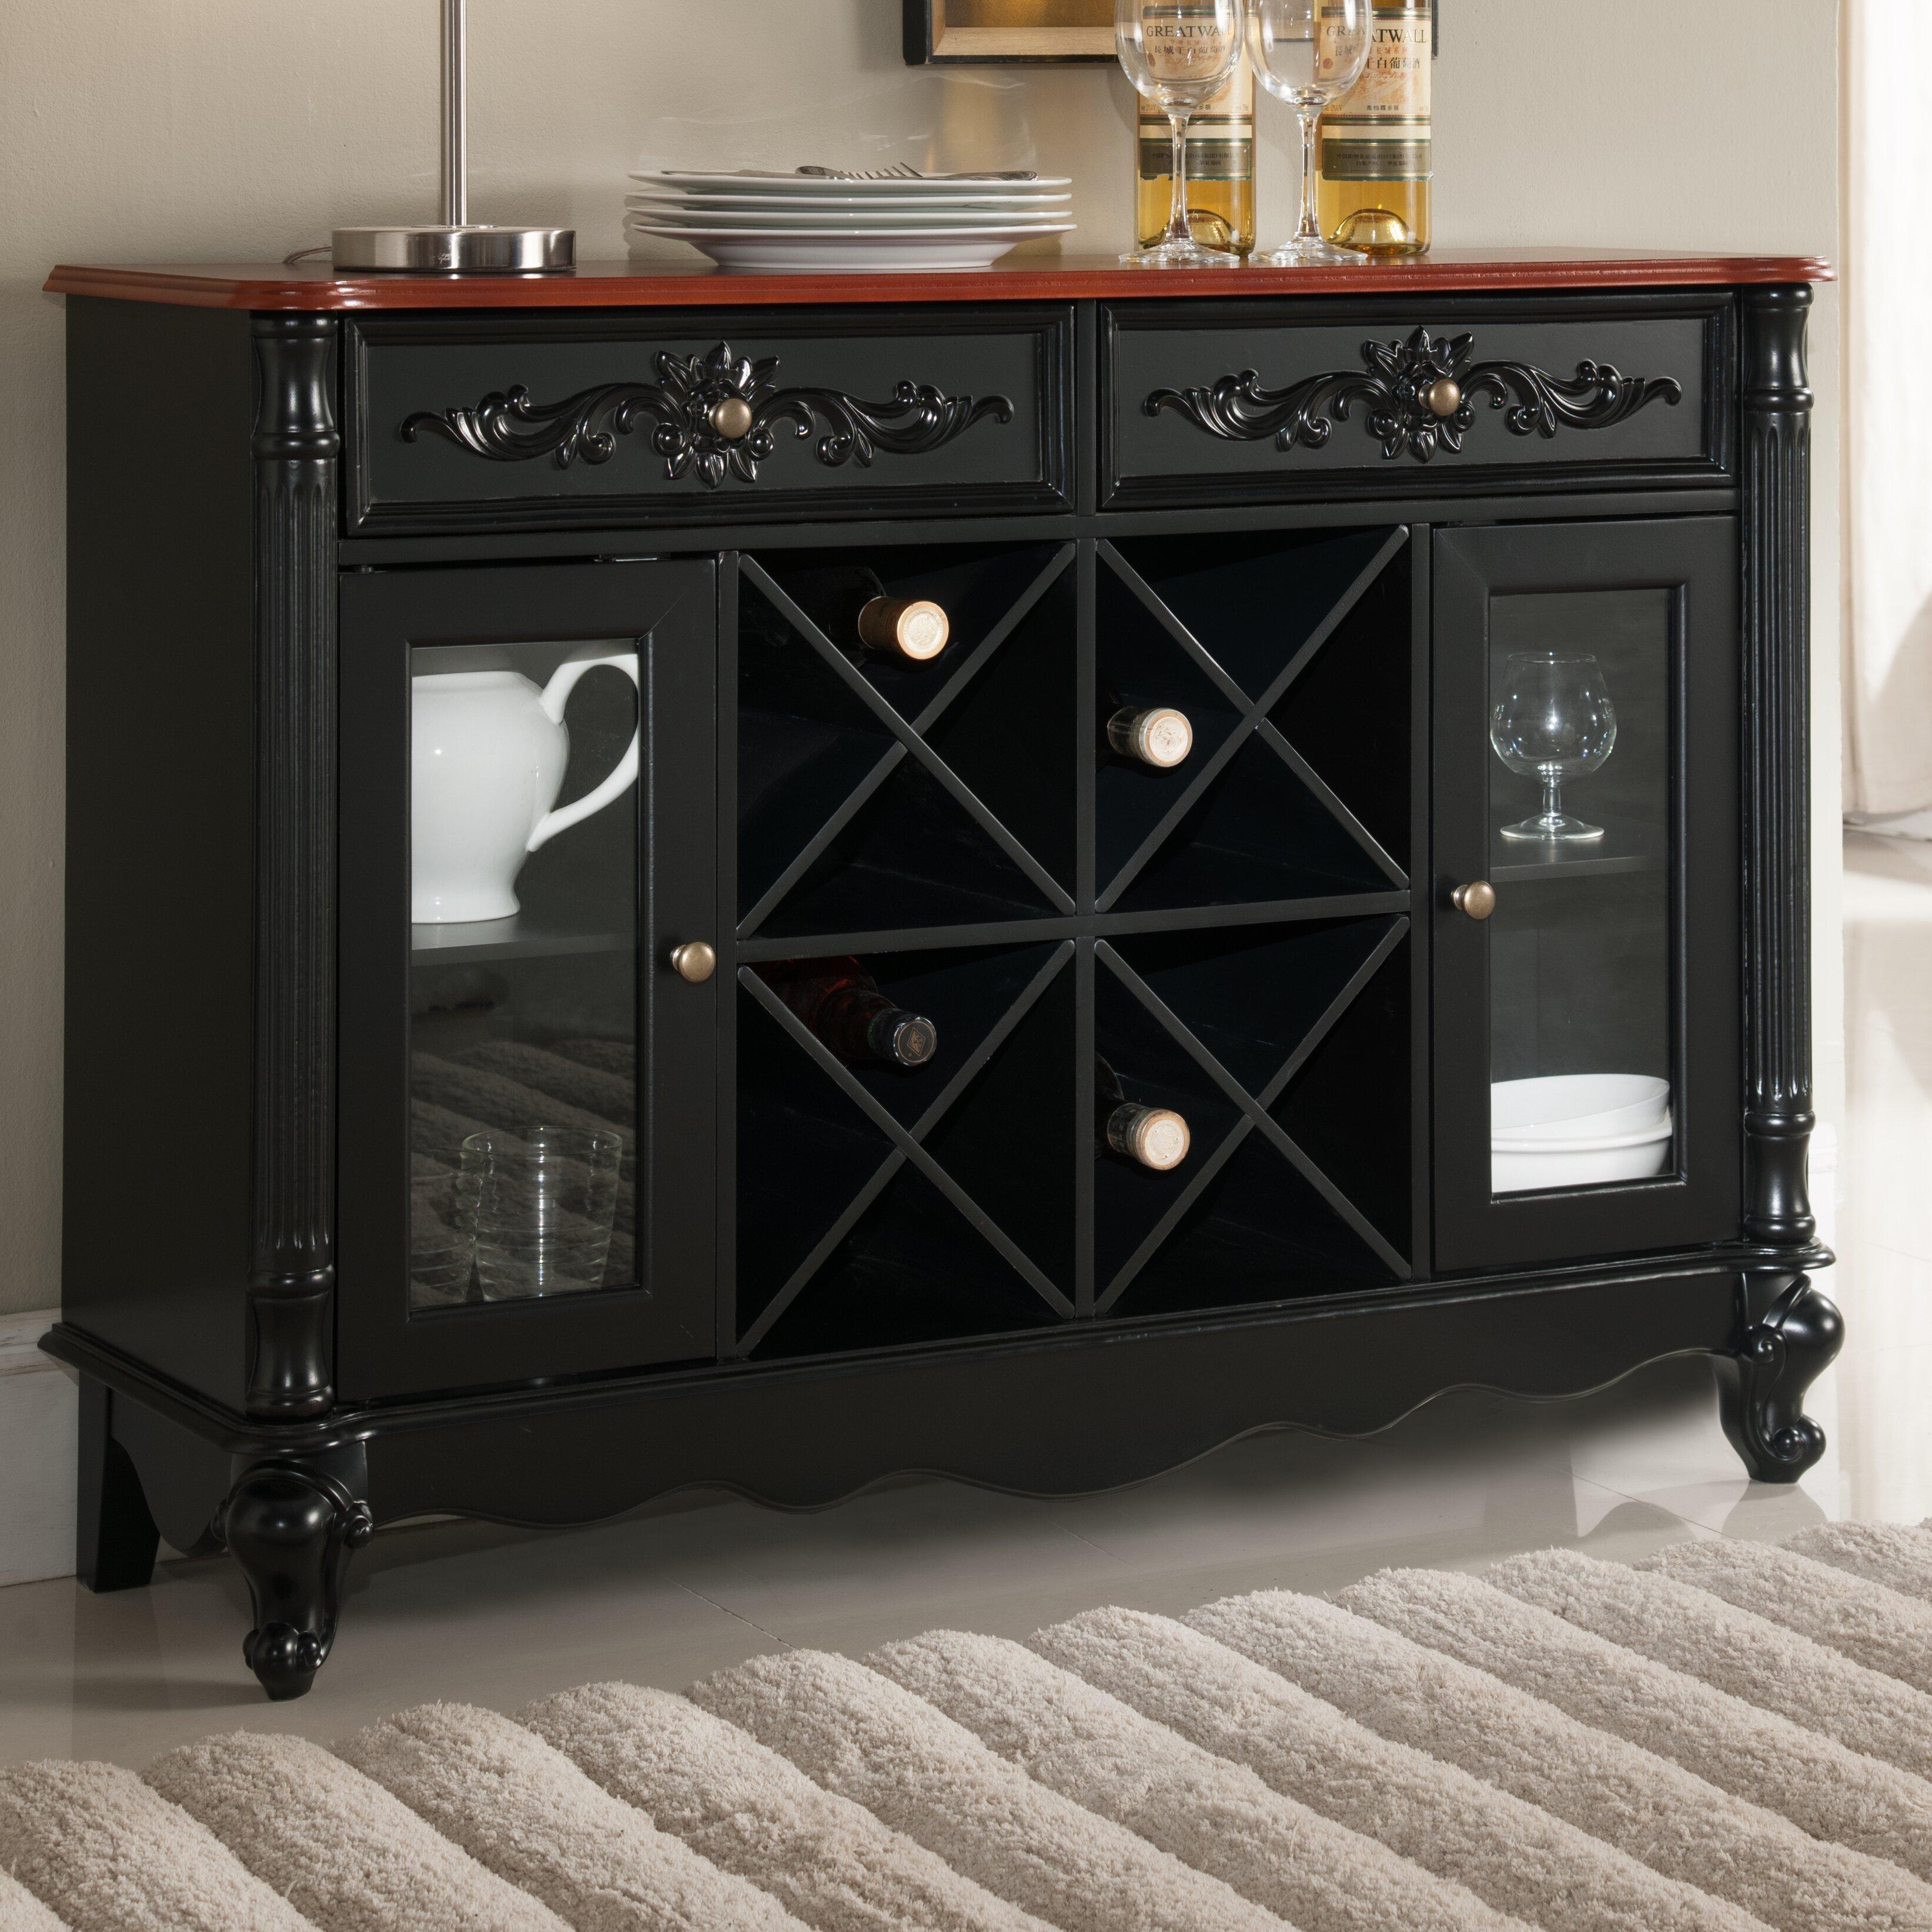 Floor Storage Cabinets Fleur De Lis Living Christensen Wood Storage 16 Bottle Floor Wine